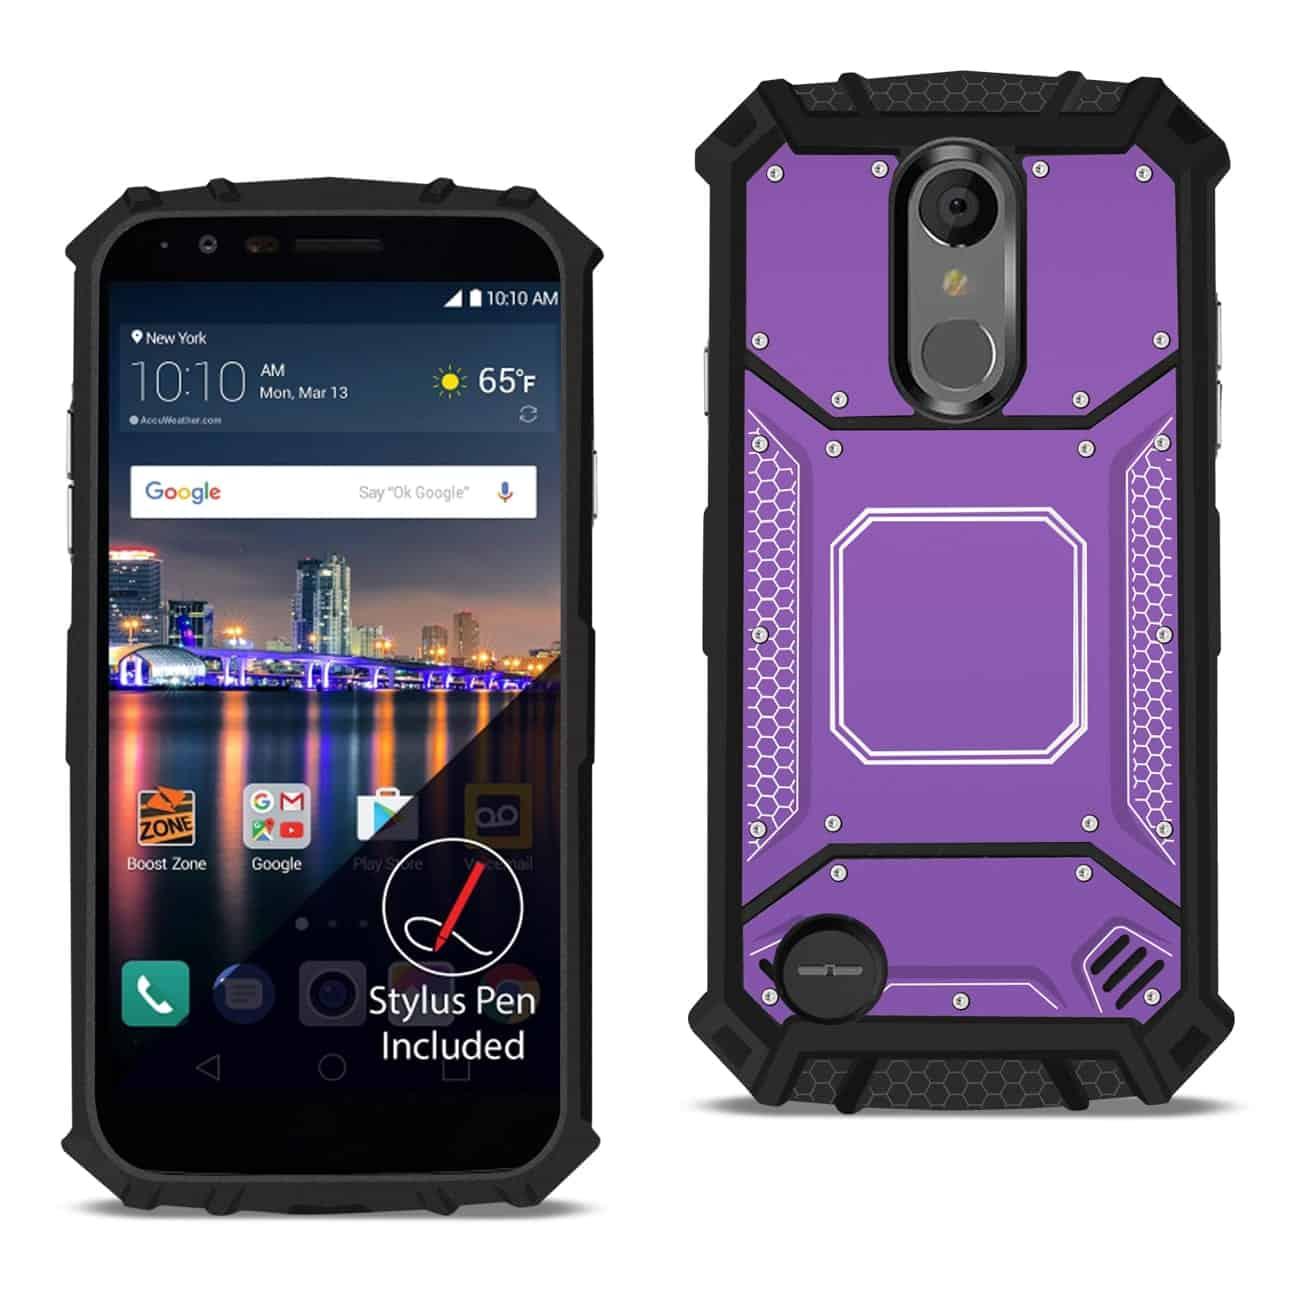 LG ARISTO 3 Metallic Front Cover Case In Purple